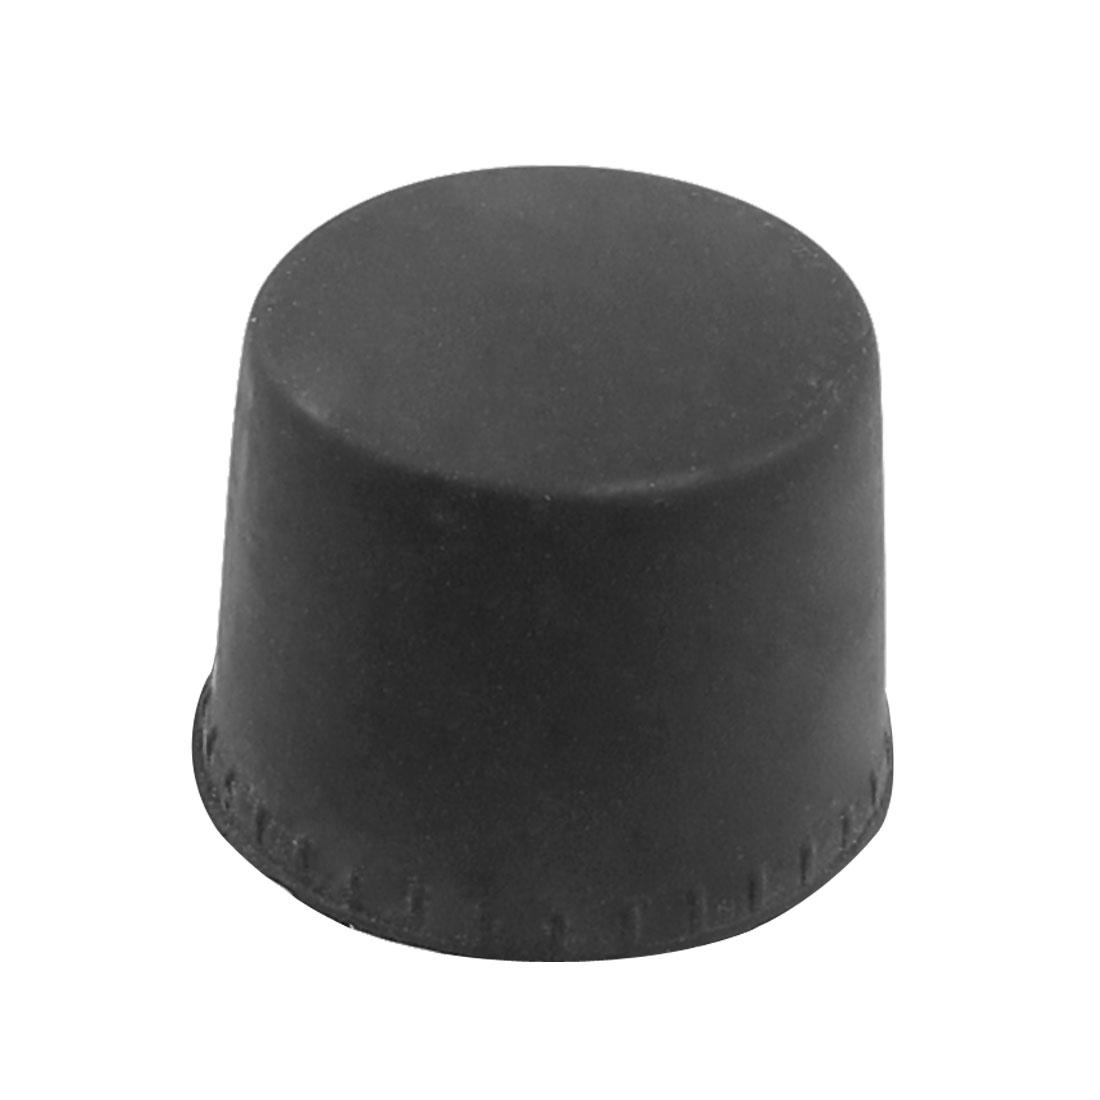 Black Bench Furniture Threaded 10mm Diameter Plastic Based Foot